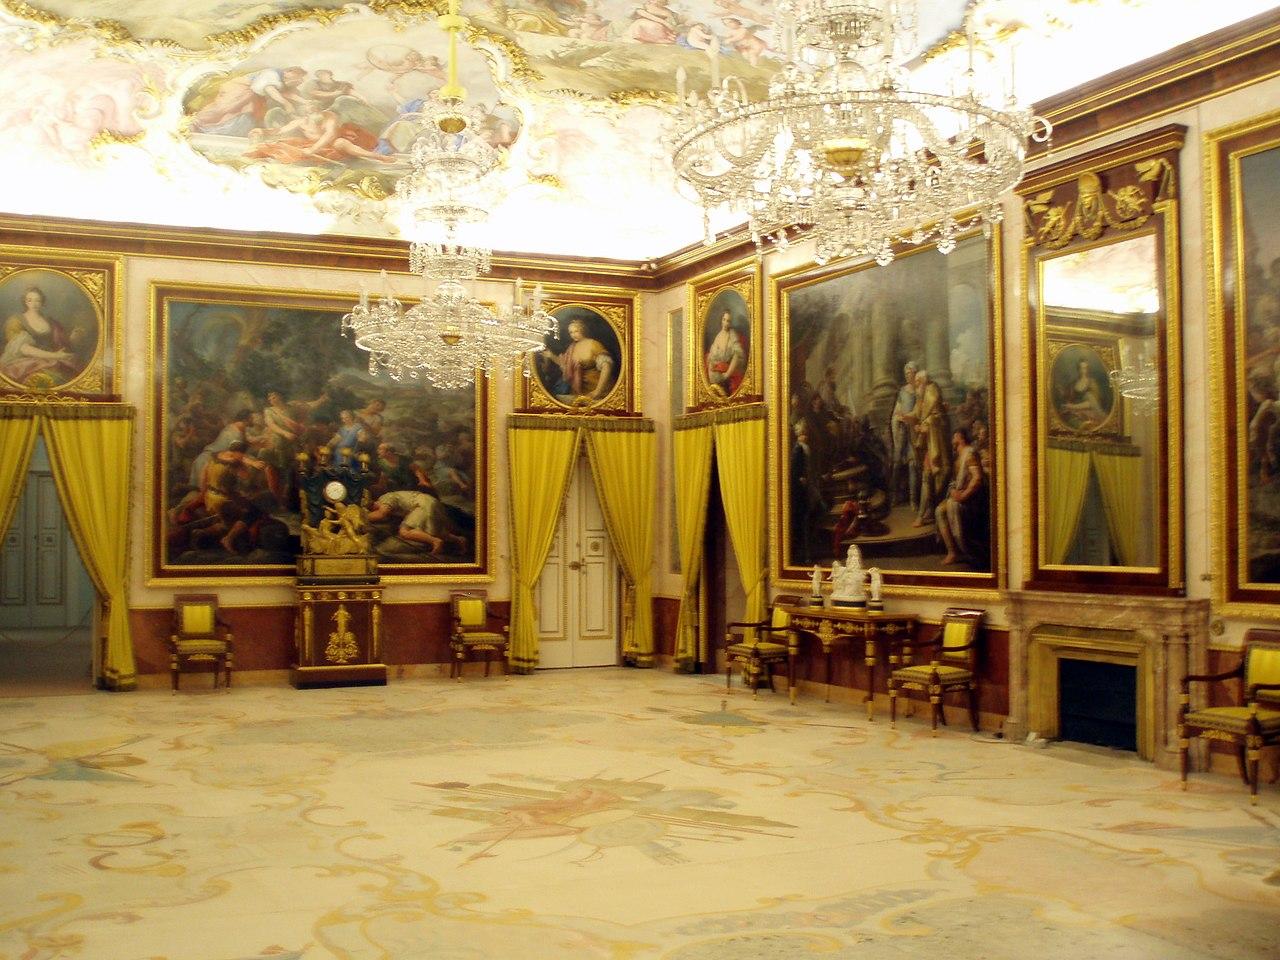 File palacio real de aranjuez interior wikipedia for Ministro de interior actual